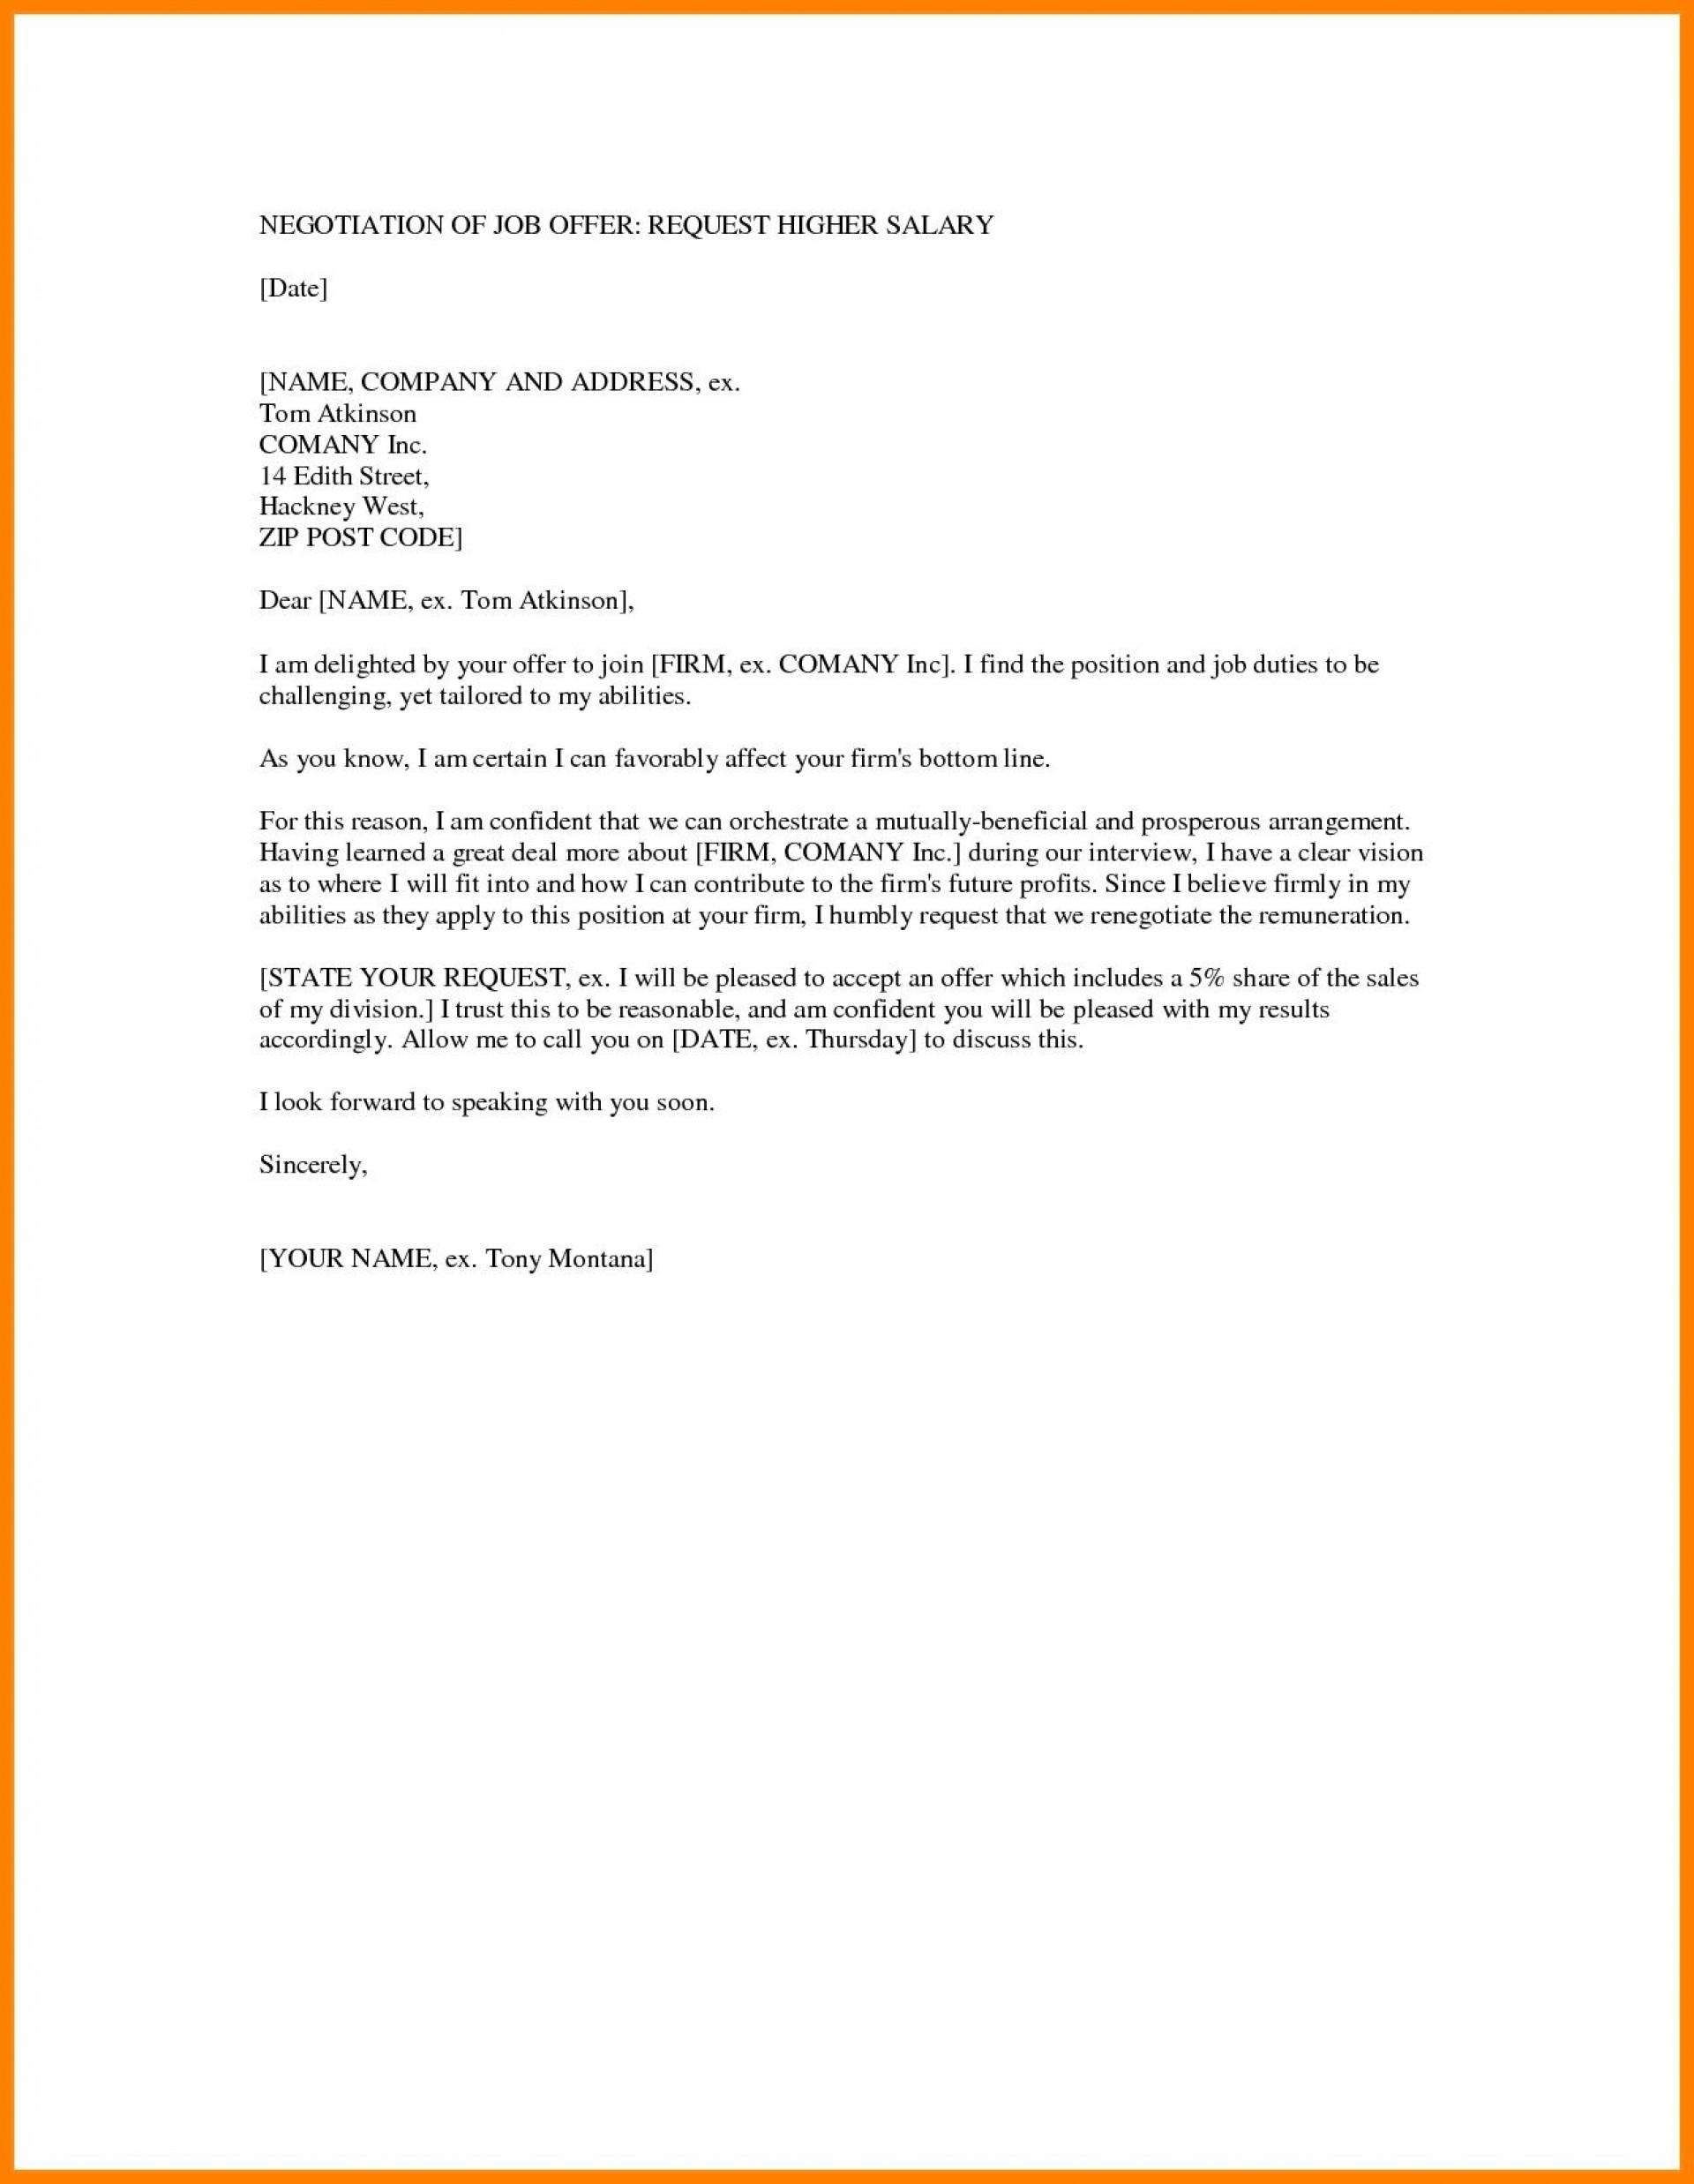 004 Dreaded Counter Offer Letter Template High Definition  Real Estate Settlement Debt1920